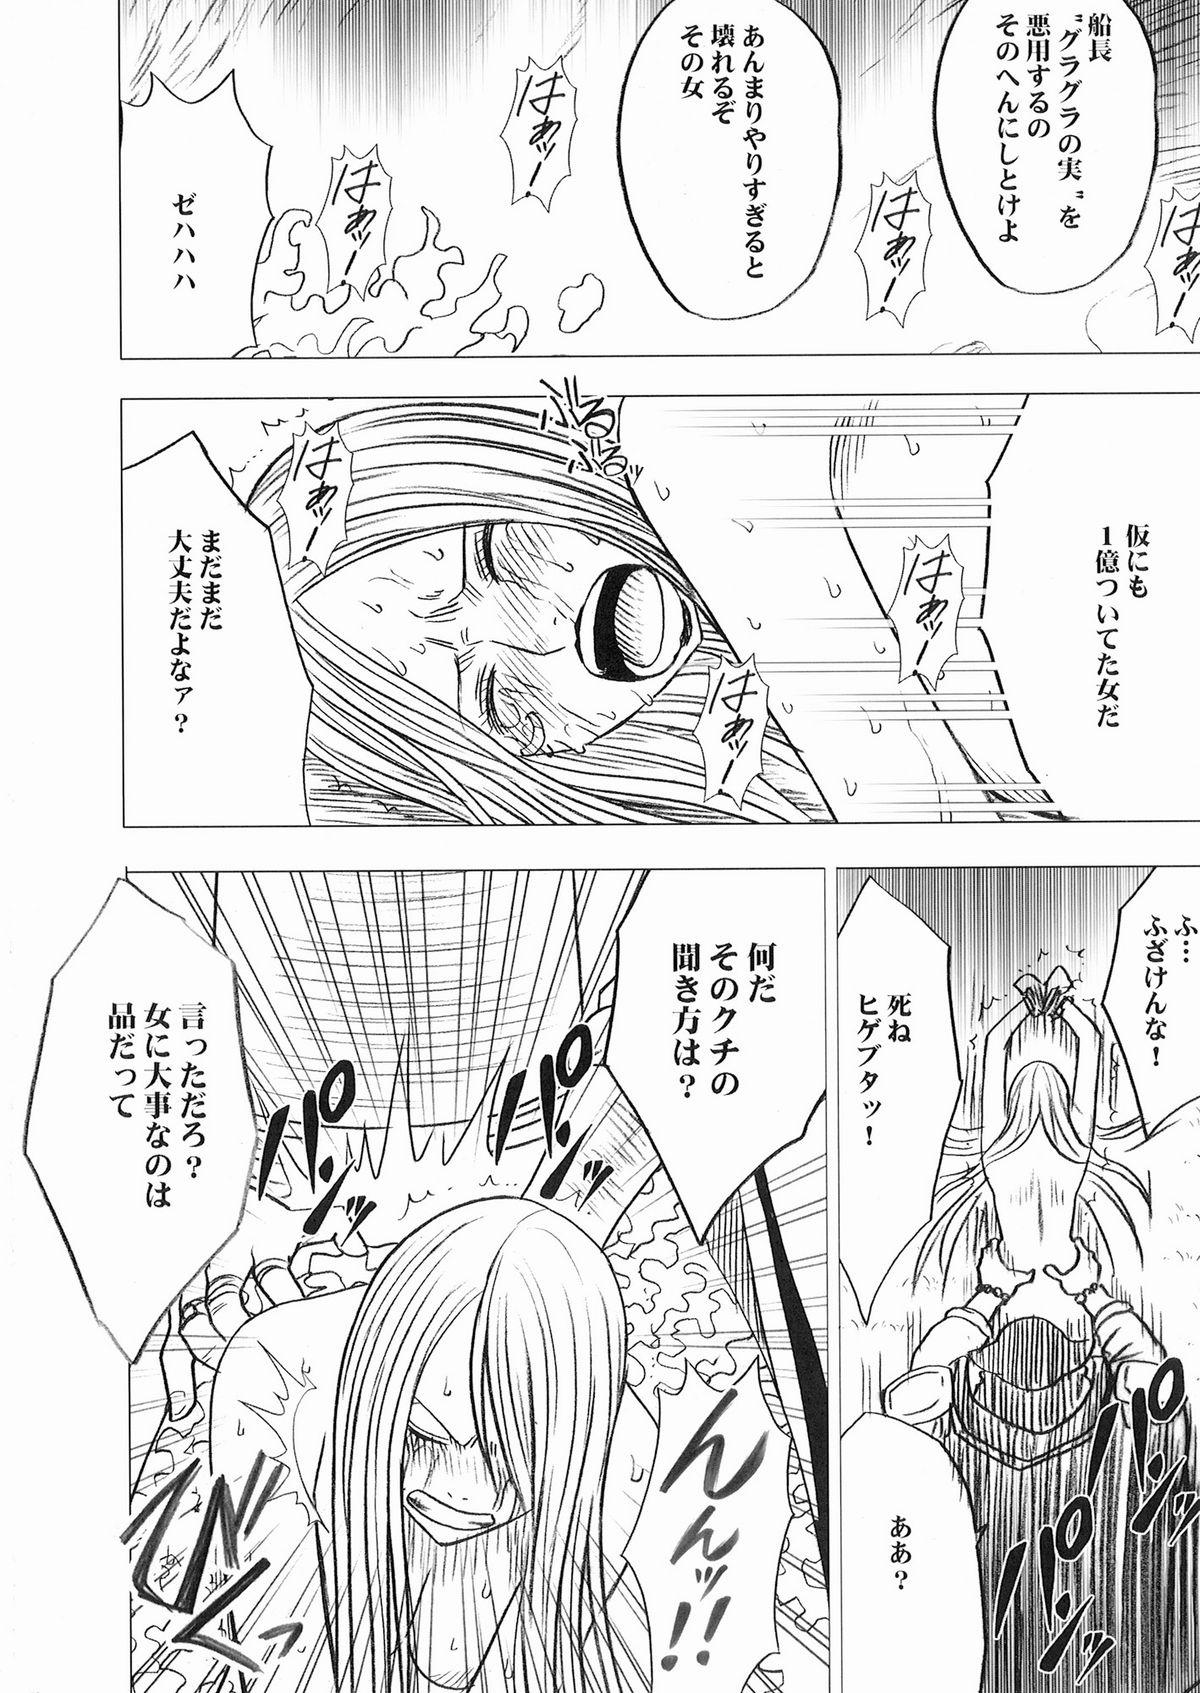 Bonnie no Haiboku 52